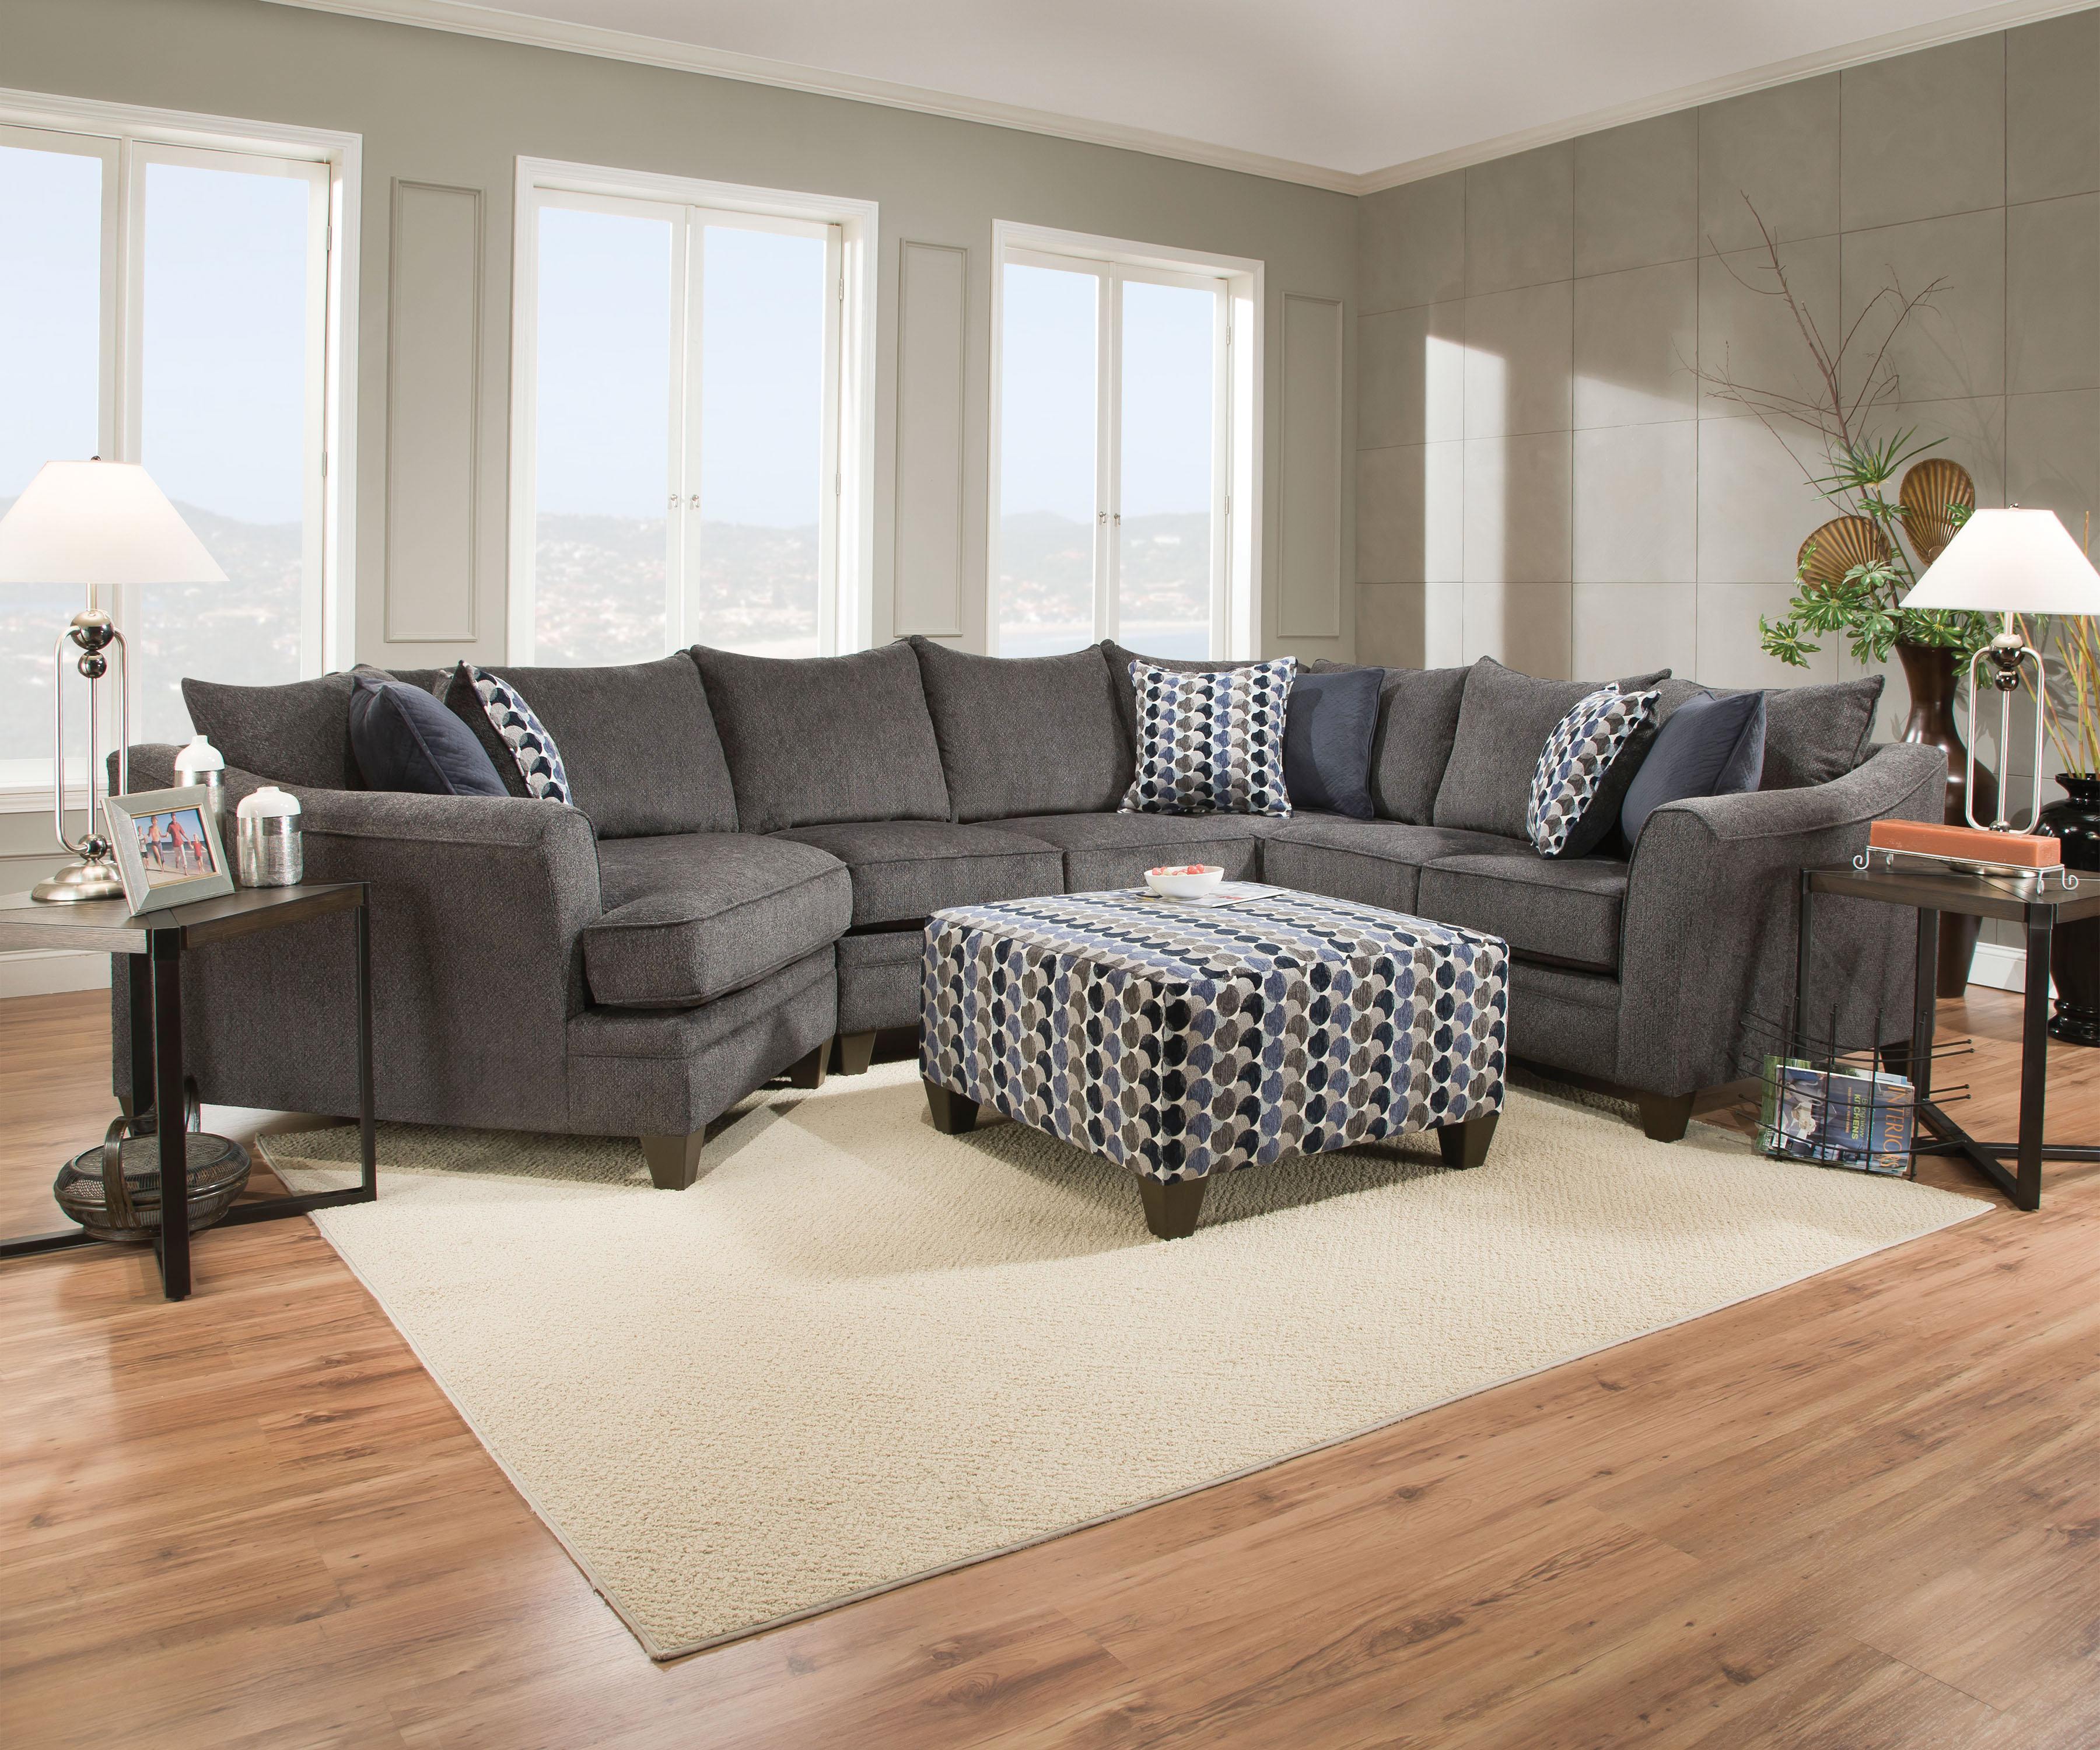 Wonderful Albany Dark Gray Sectional Sofa W/Pillows,Acme